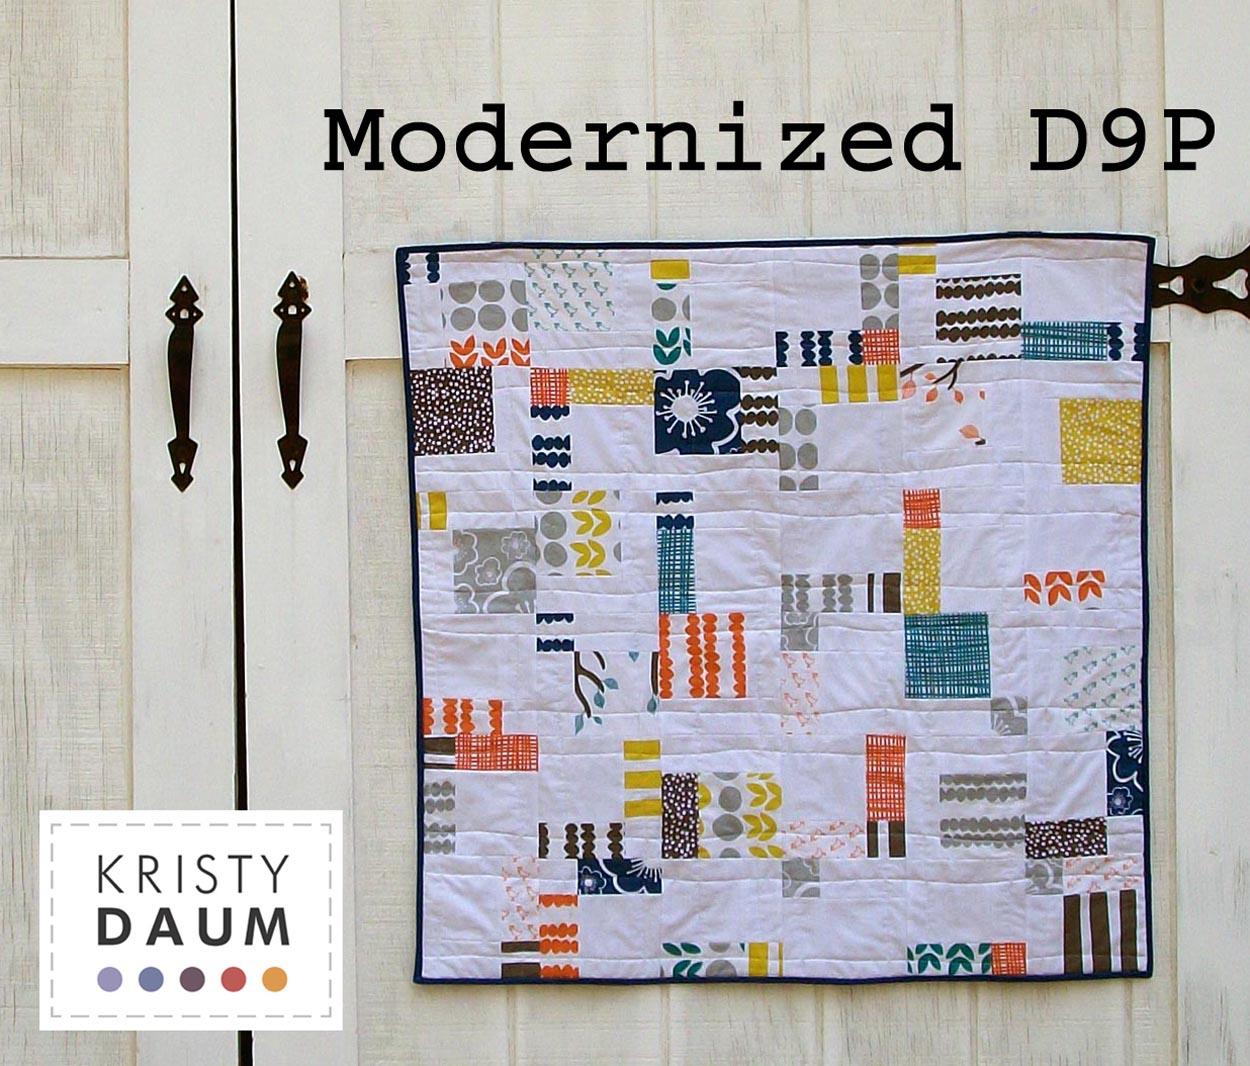 modernized